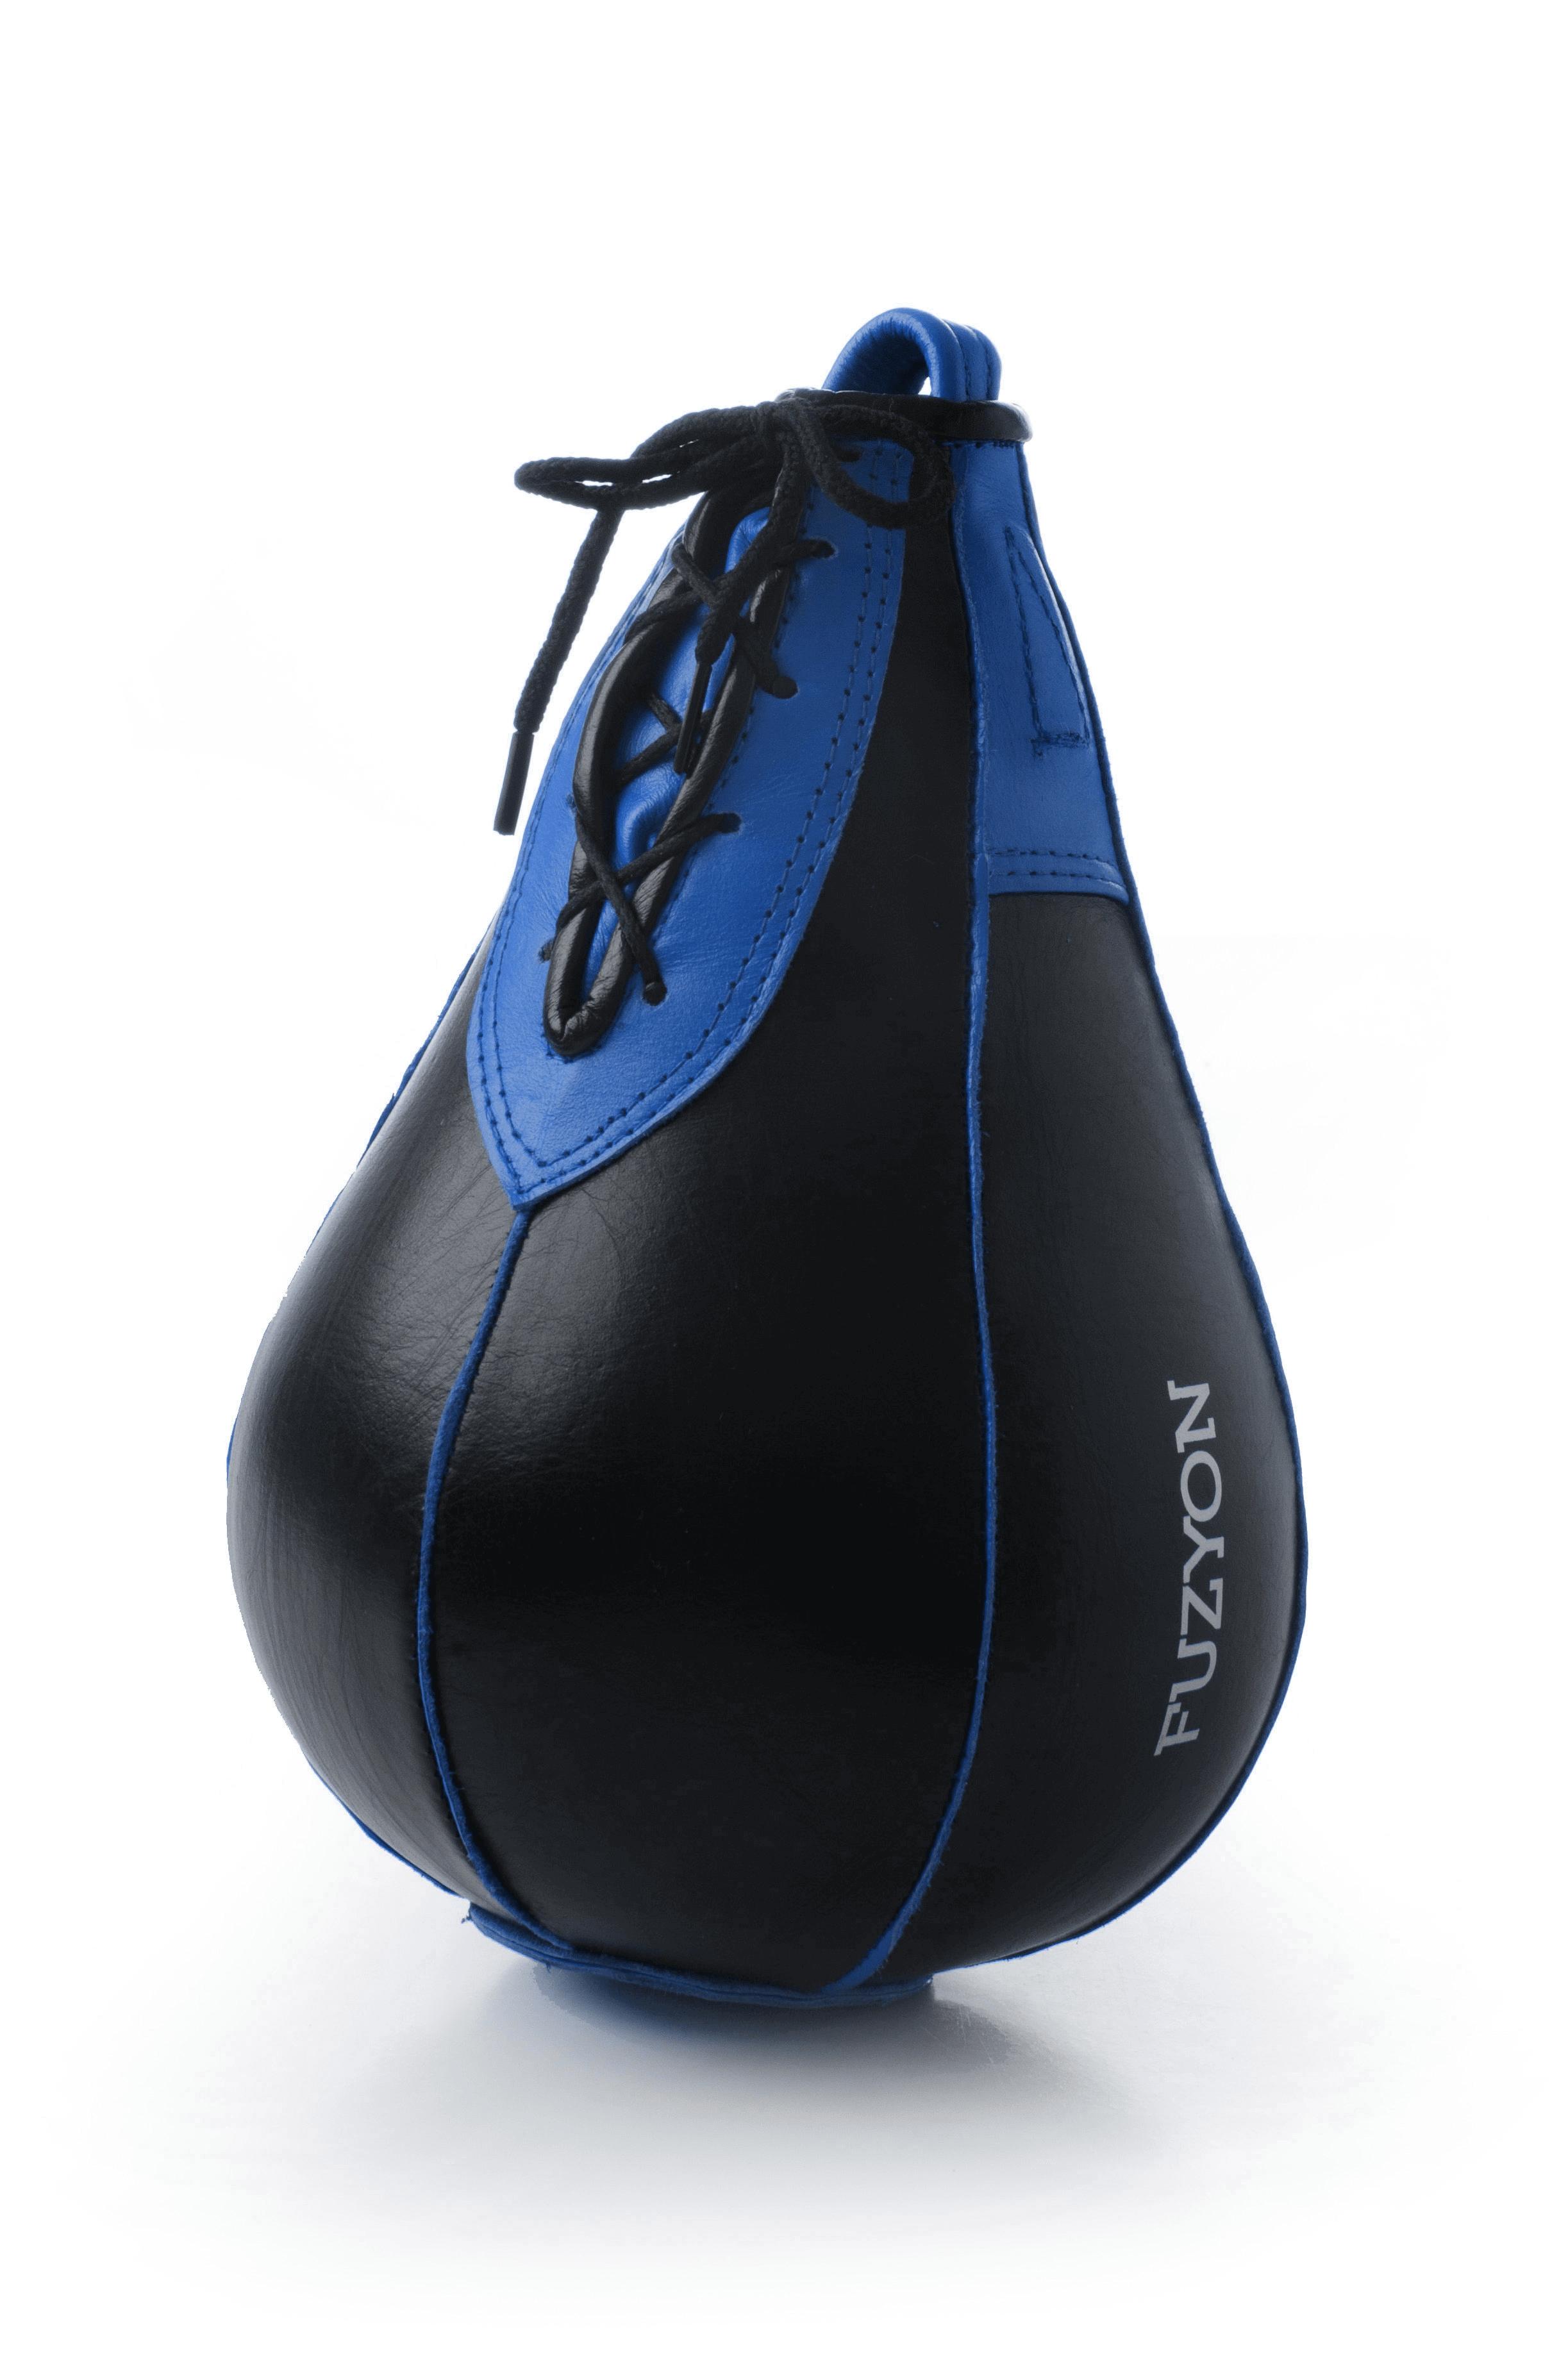 Speed Ball Fuzyon BLUE